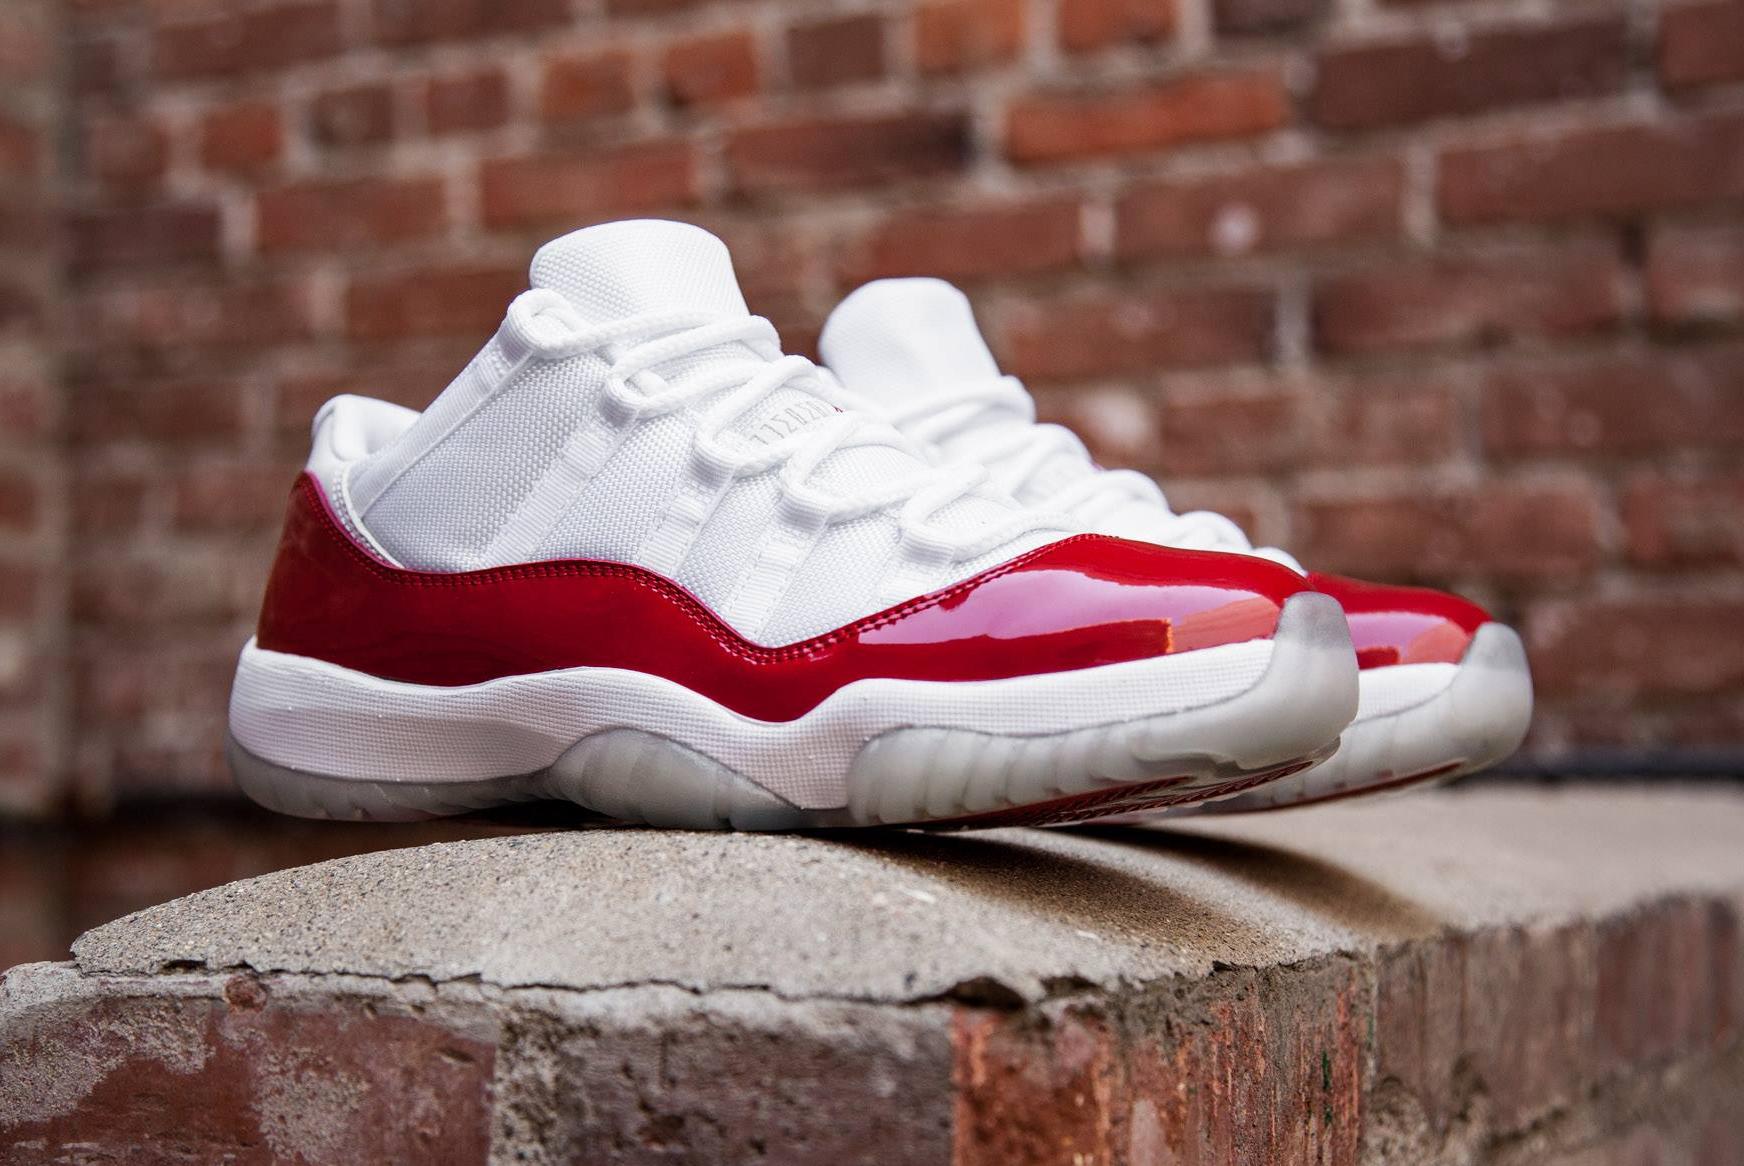 acheter basket Air Jordan 11 Low Retro 'White Varsity Red' 2016 (1)